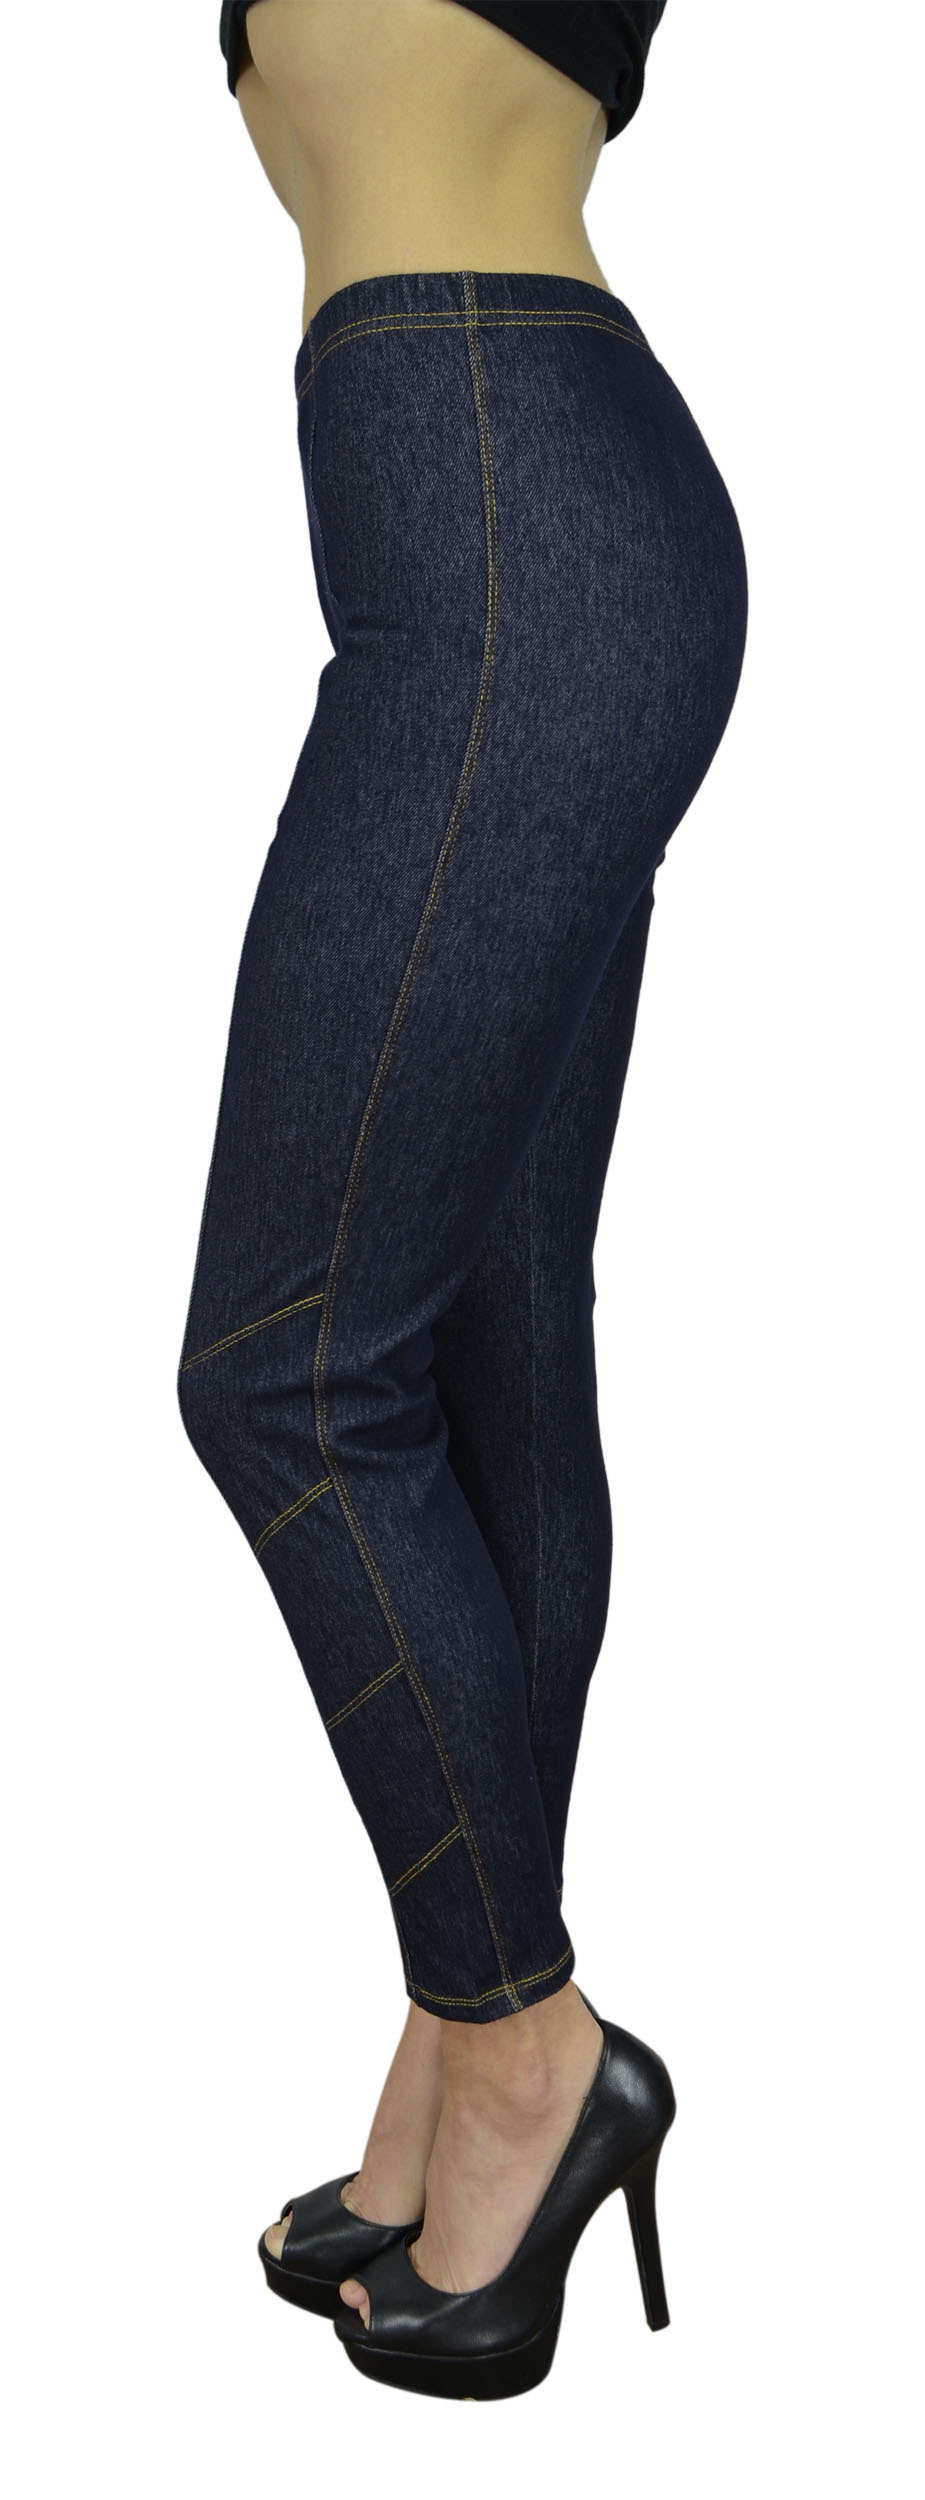 Belle Donne Women's Legging Jeggings Footless - Contrast Stitching-Blue